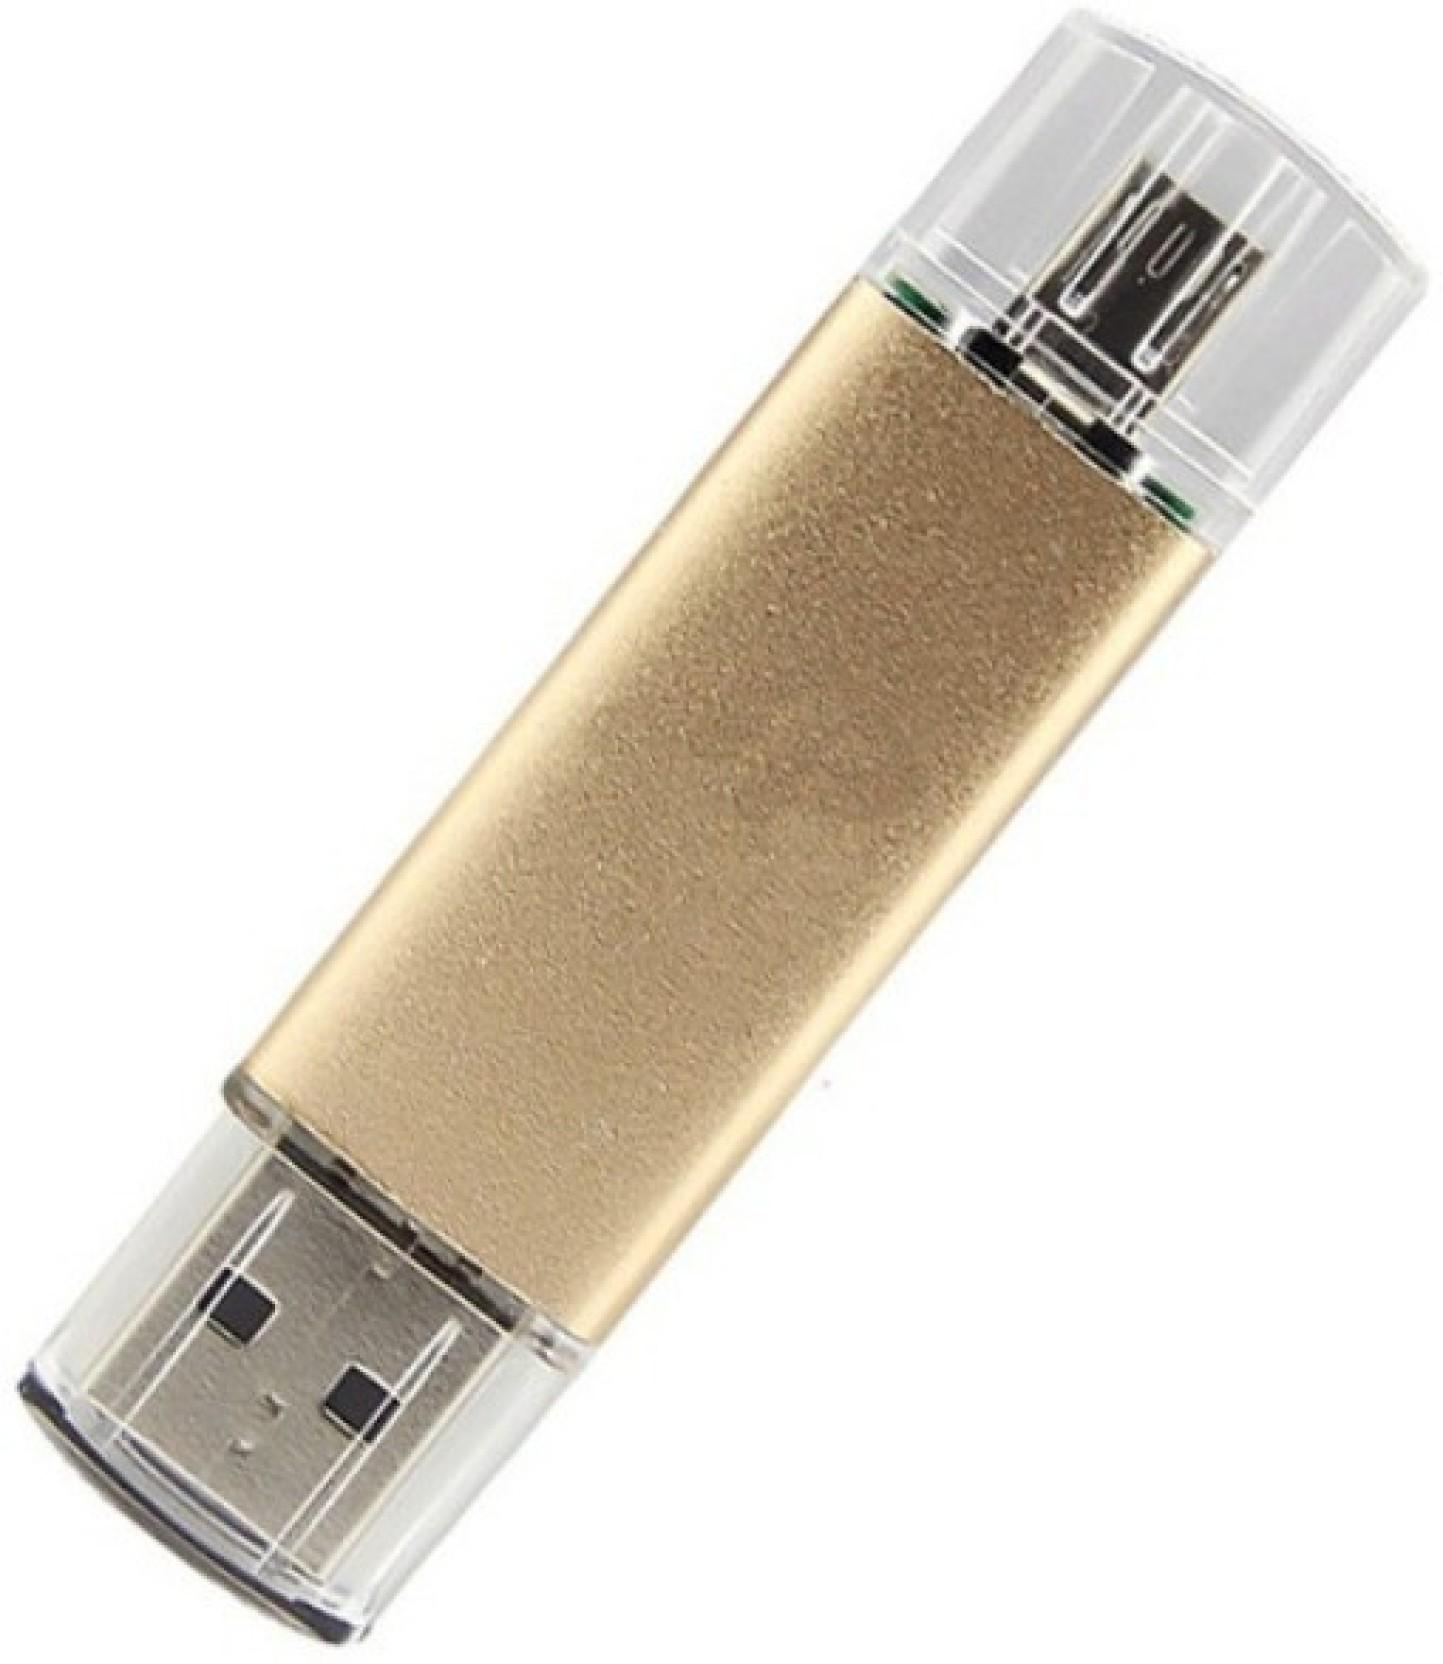 Spek Harga Sandisk OTG Flash Disk 16GB USB 3 0 Bulan Ini Indonesia Source · Warwolf